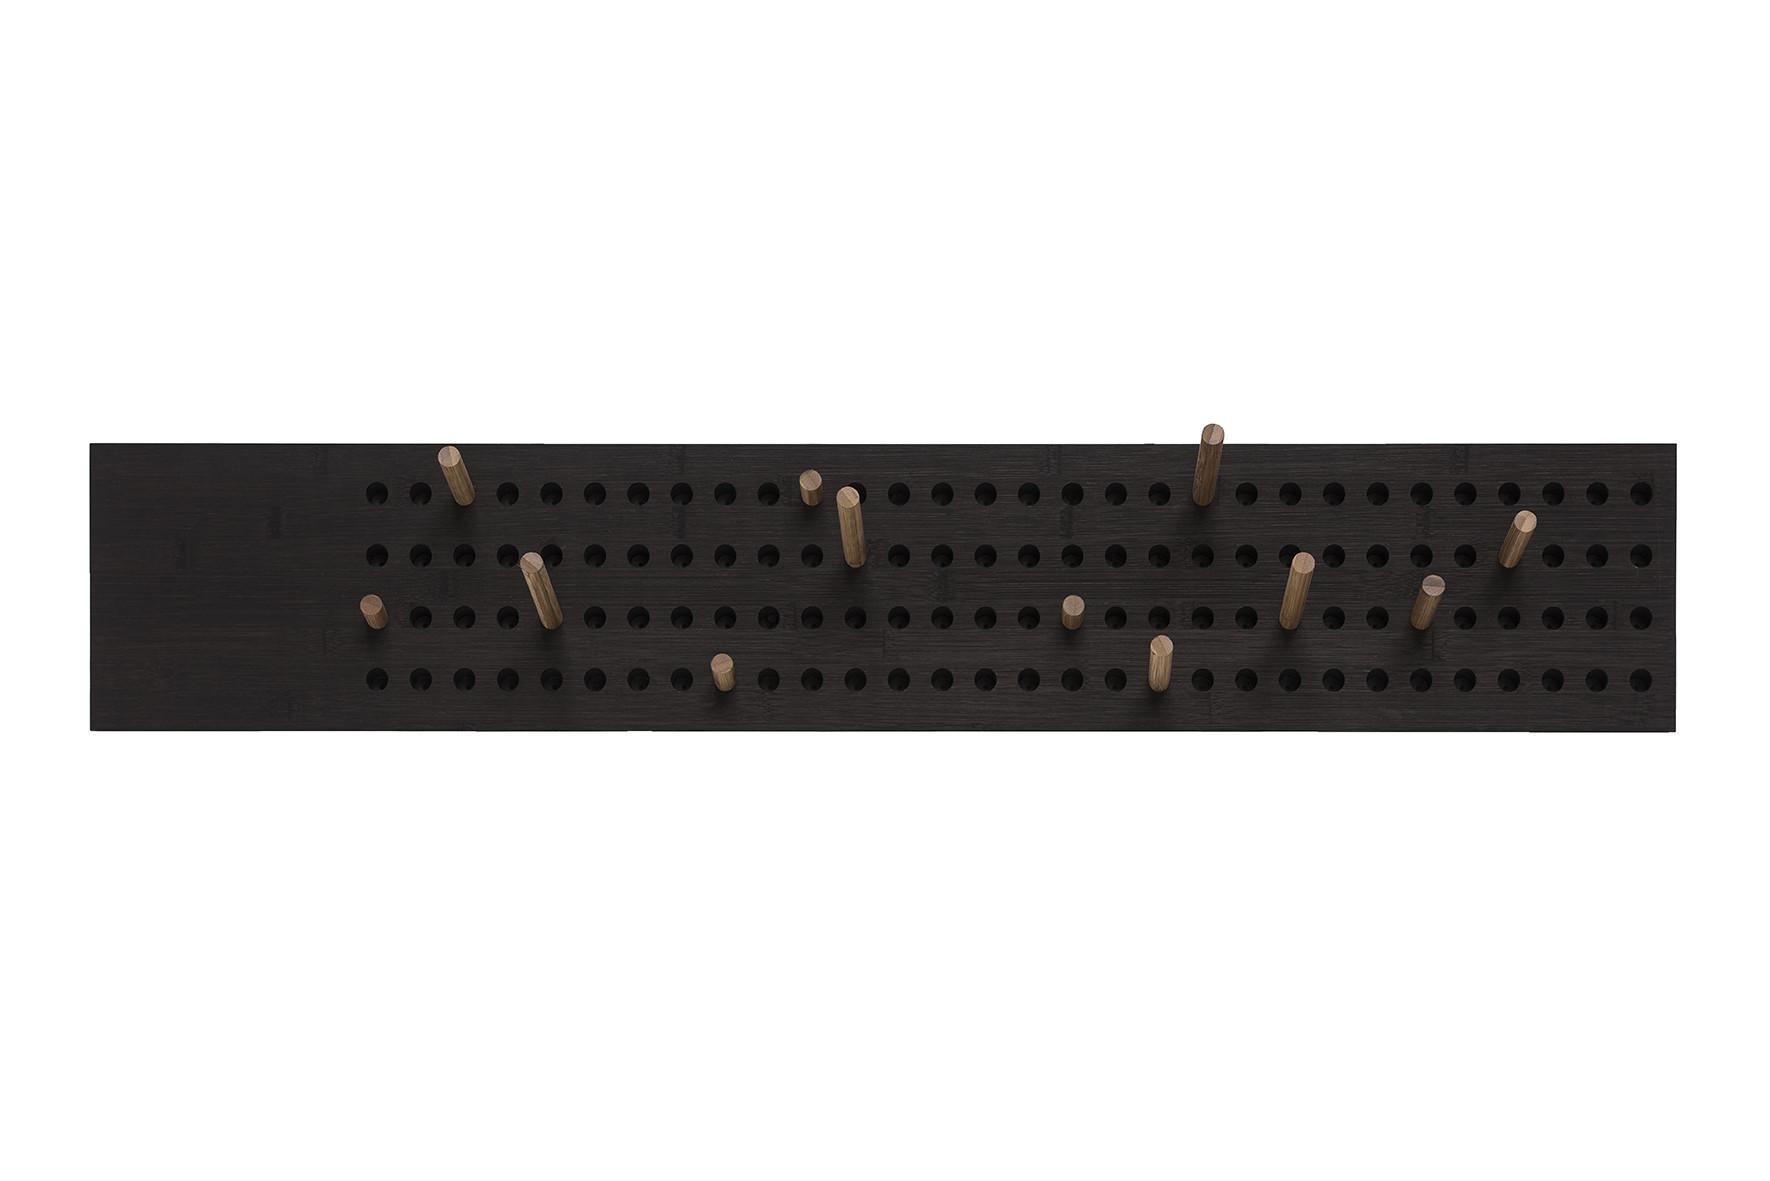 Gardarobe Scoredboard Large Horizontal-Bambusholz Nachhaltig - Kopieren - Kopieren 11